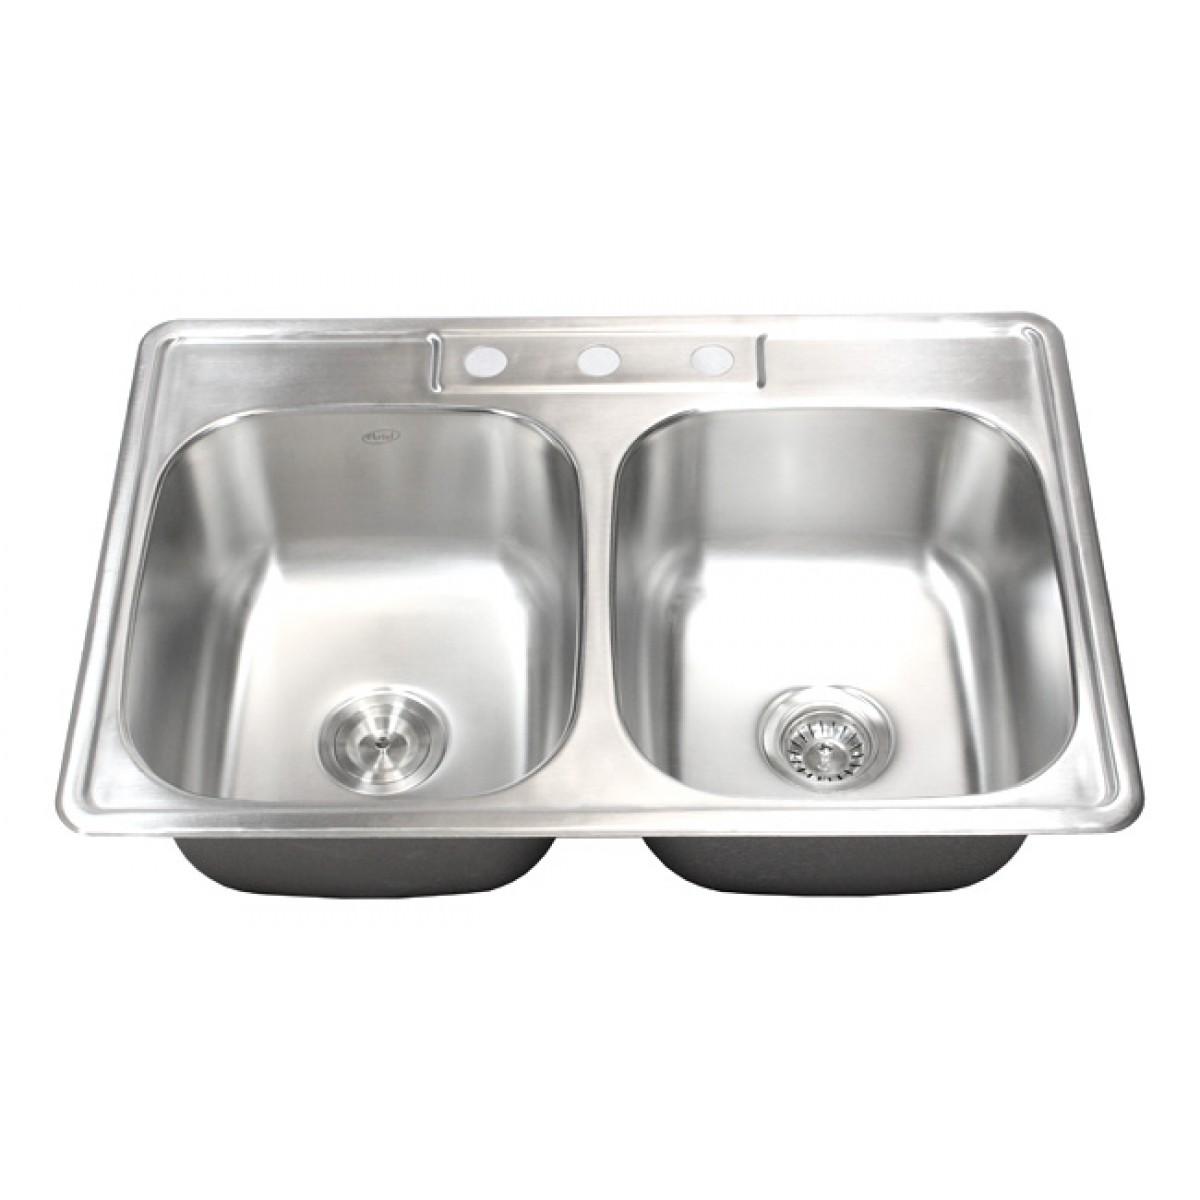 33 inch stainless steel top mount drop in 50 50 double bowl kitchen sink 18 gauge